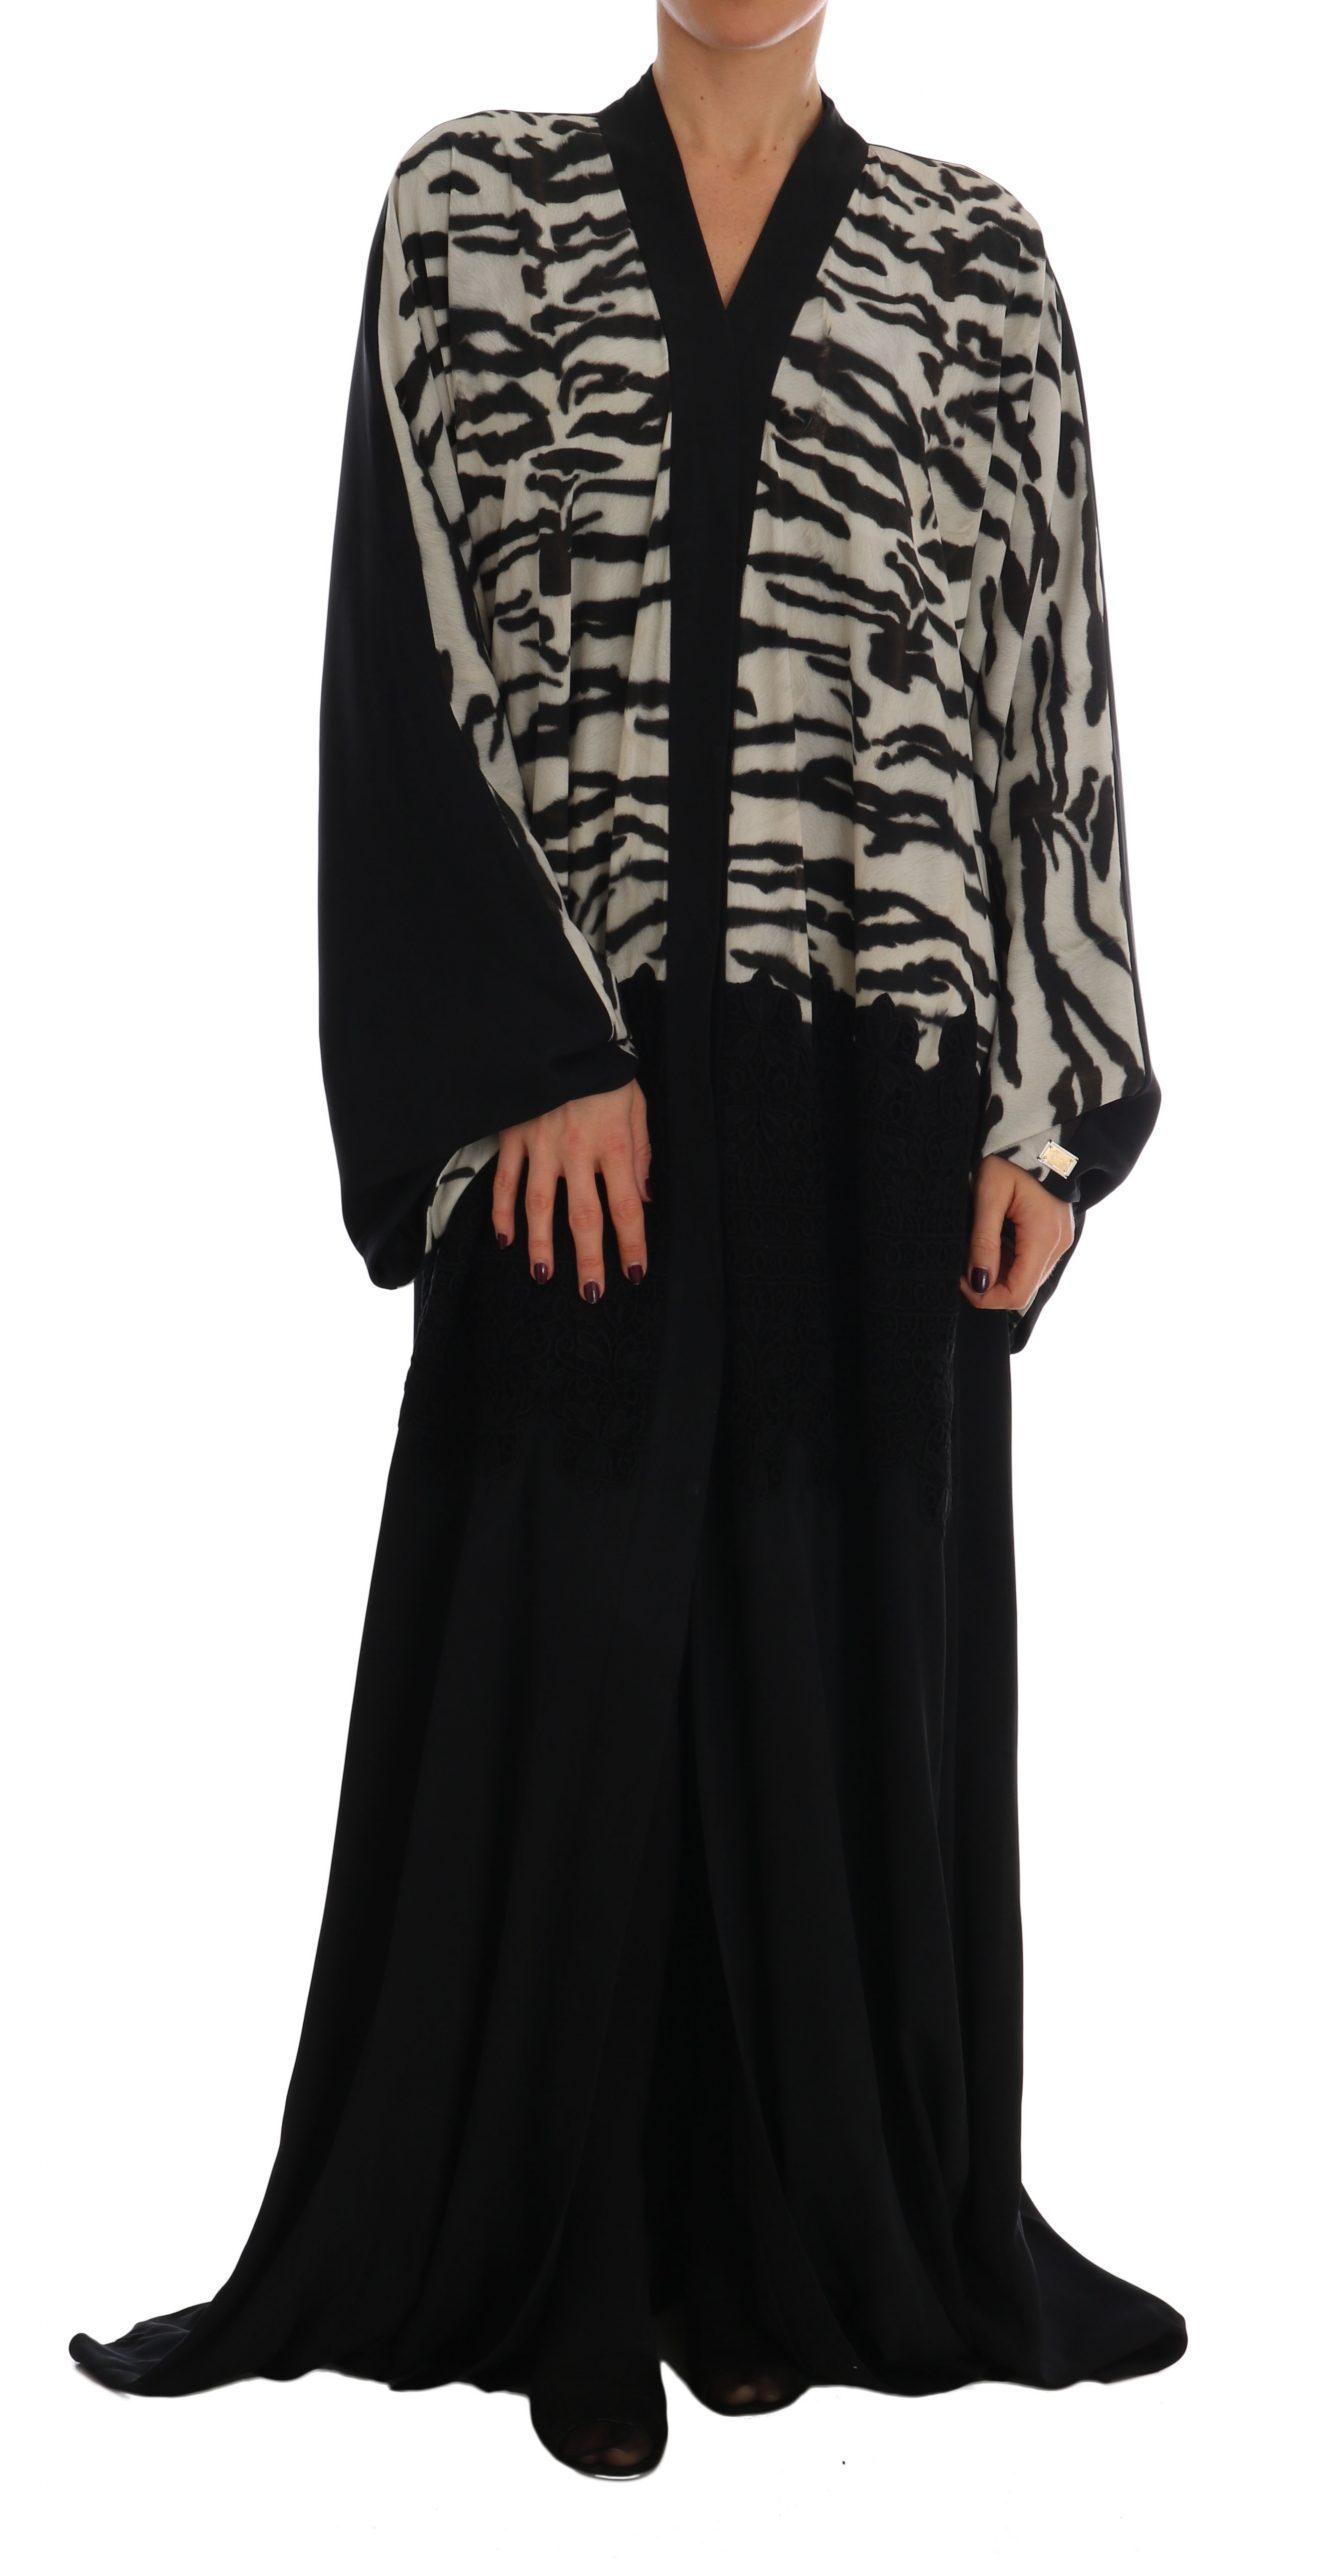 Dolce & Gabbana Women's Zebra Kaftan Abaya Cape Silk Dress Black DR1392 - IT48|XXL